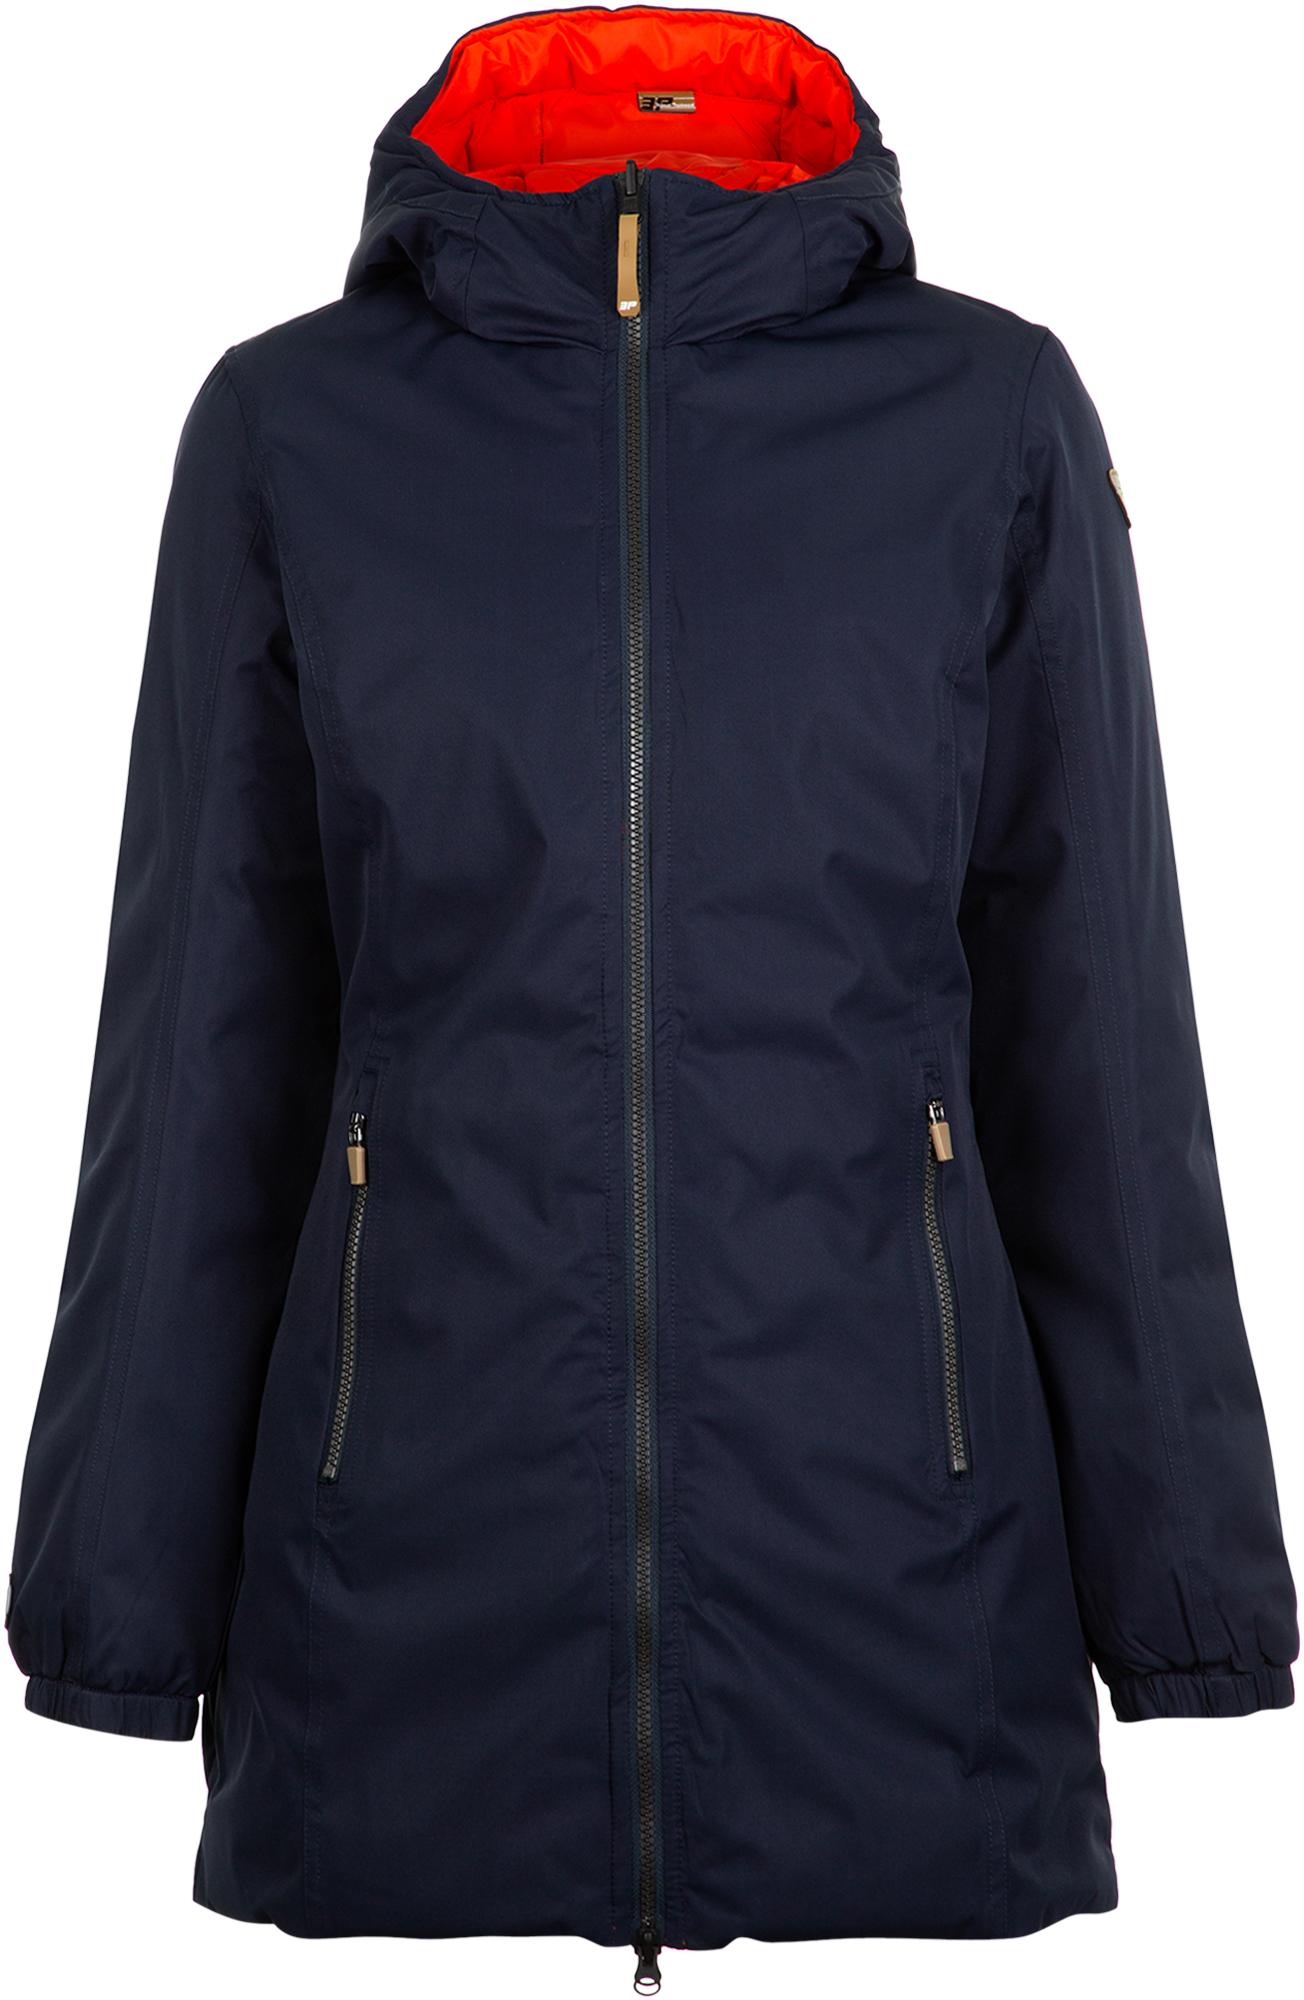 IcePeak Куртка утепленная женская IcePeak Philippi, размер 44 цена 2017